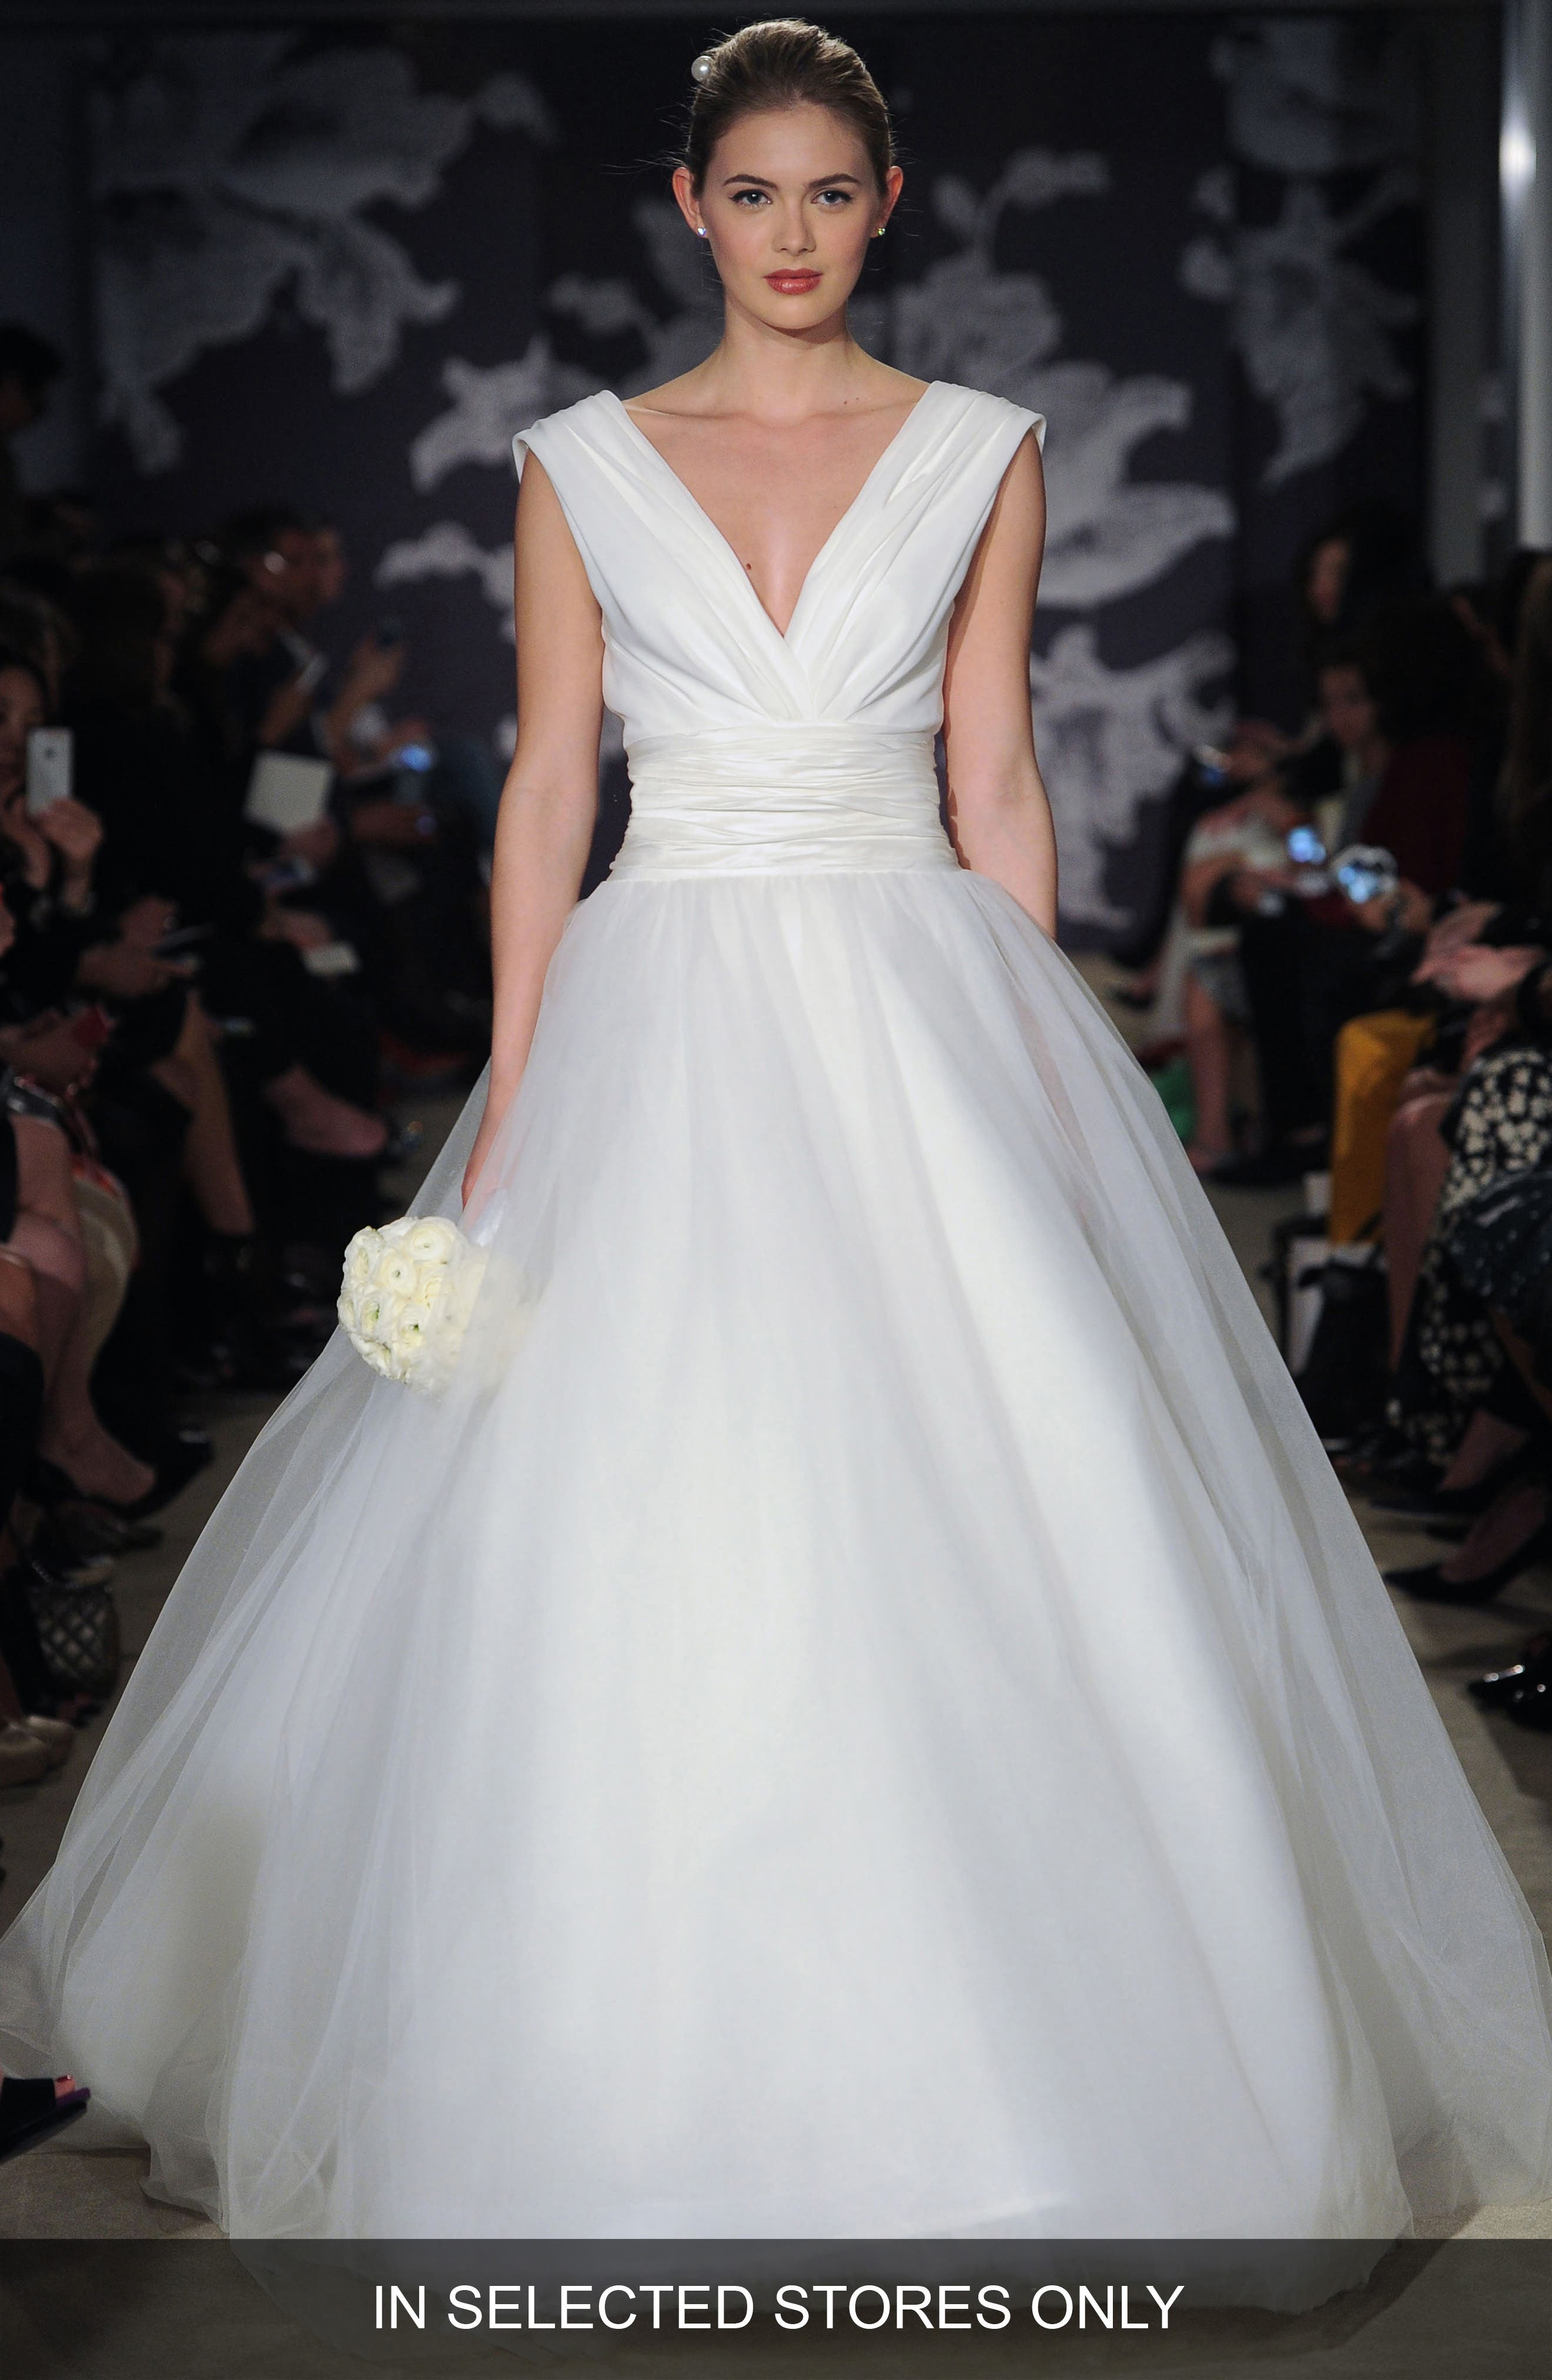 Carolina Herrera 'Chloe' V-Neck Georgette & Tulle Ballgown (In Stores Only)